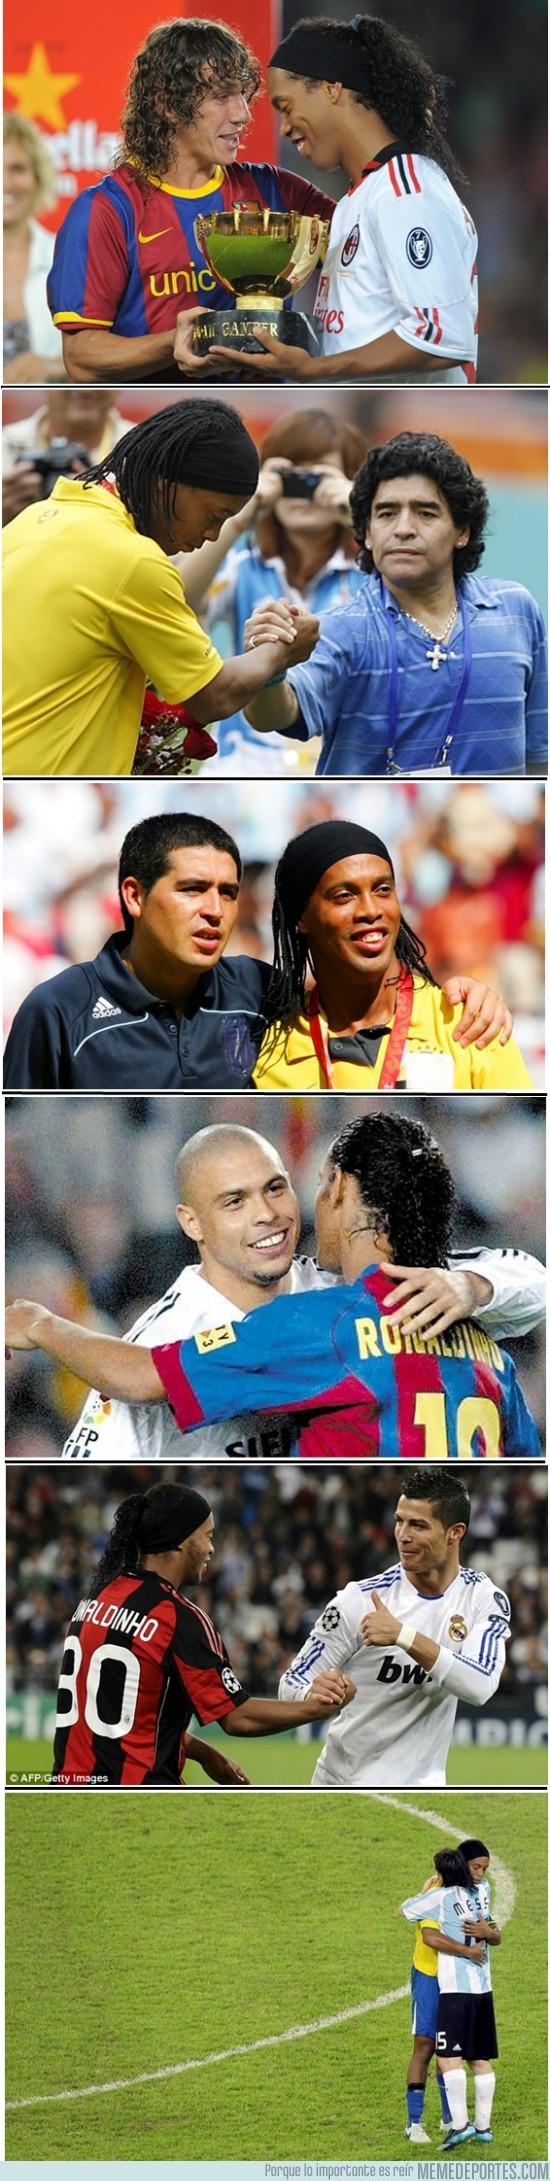 73466 - Ronaldinho, imposible no quererlo